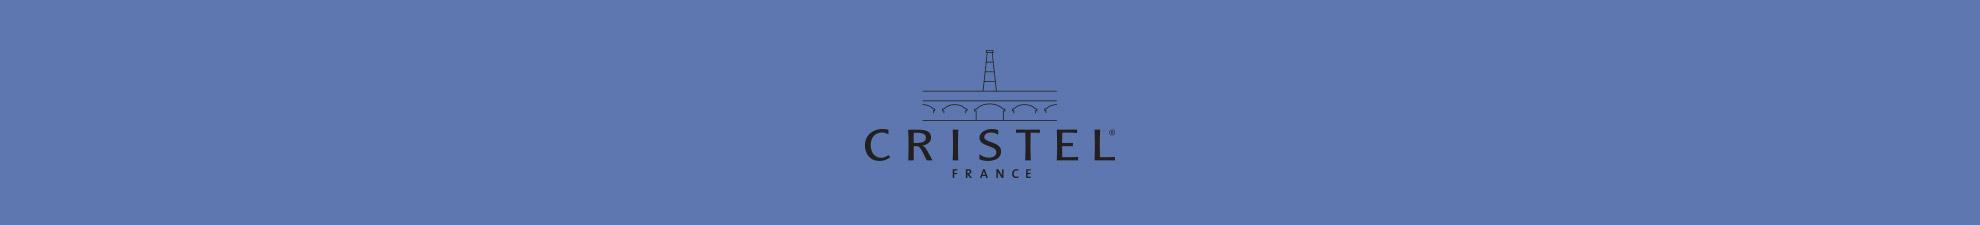 Logo Cristel wide